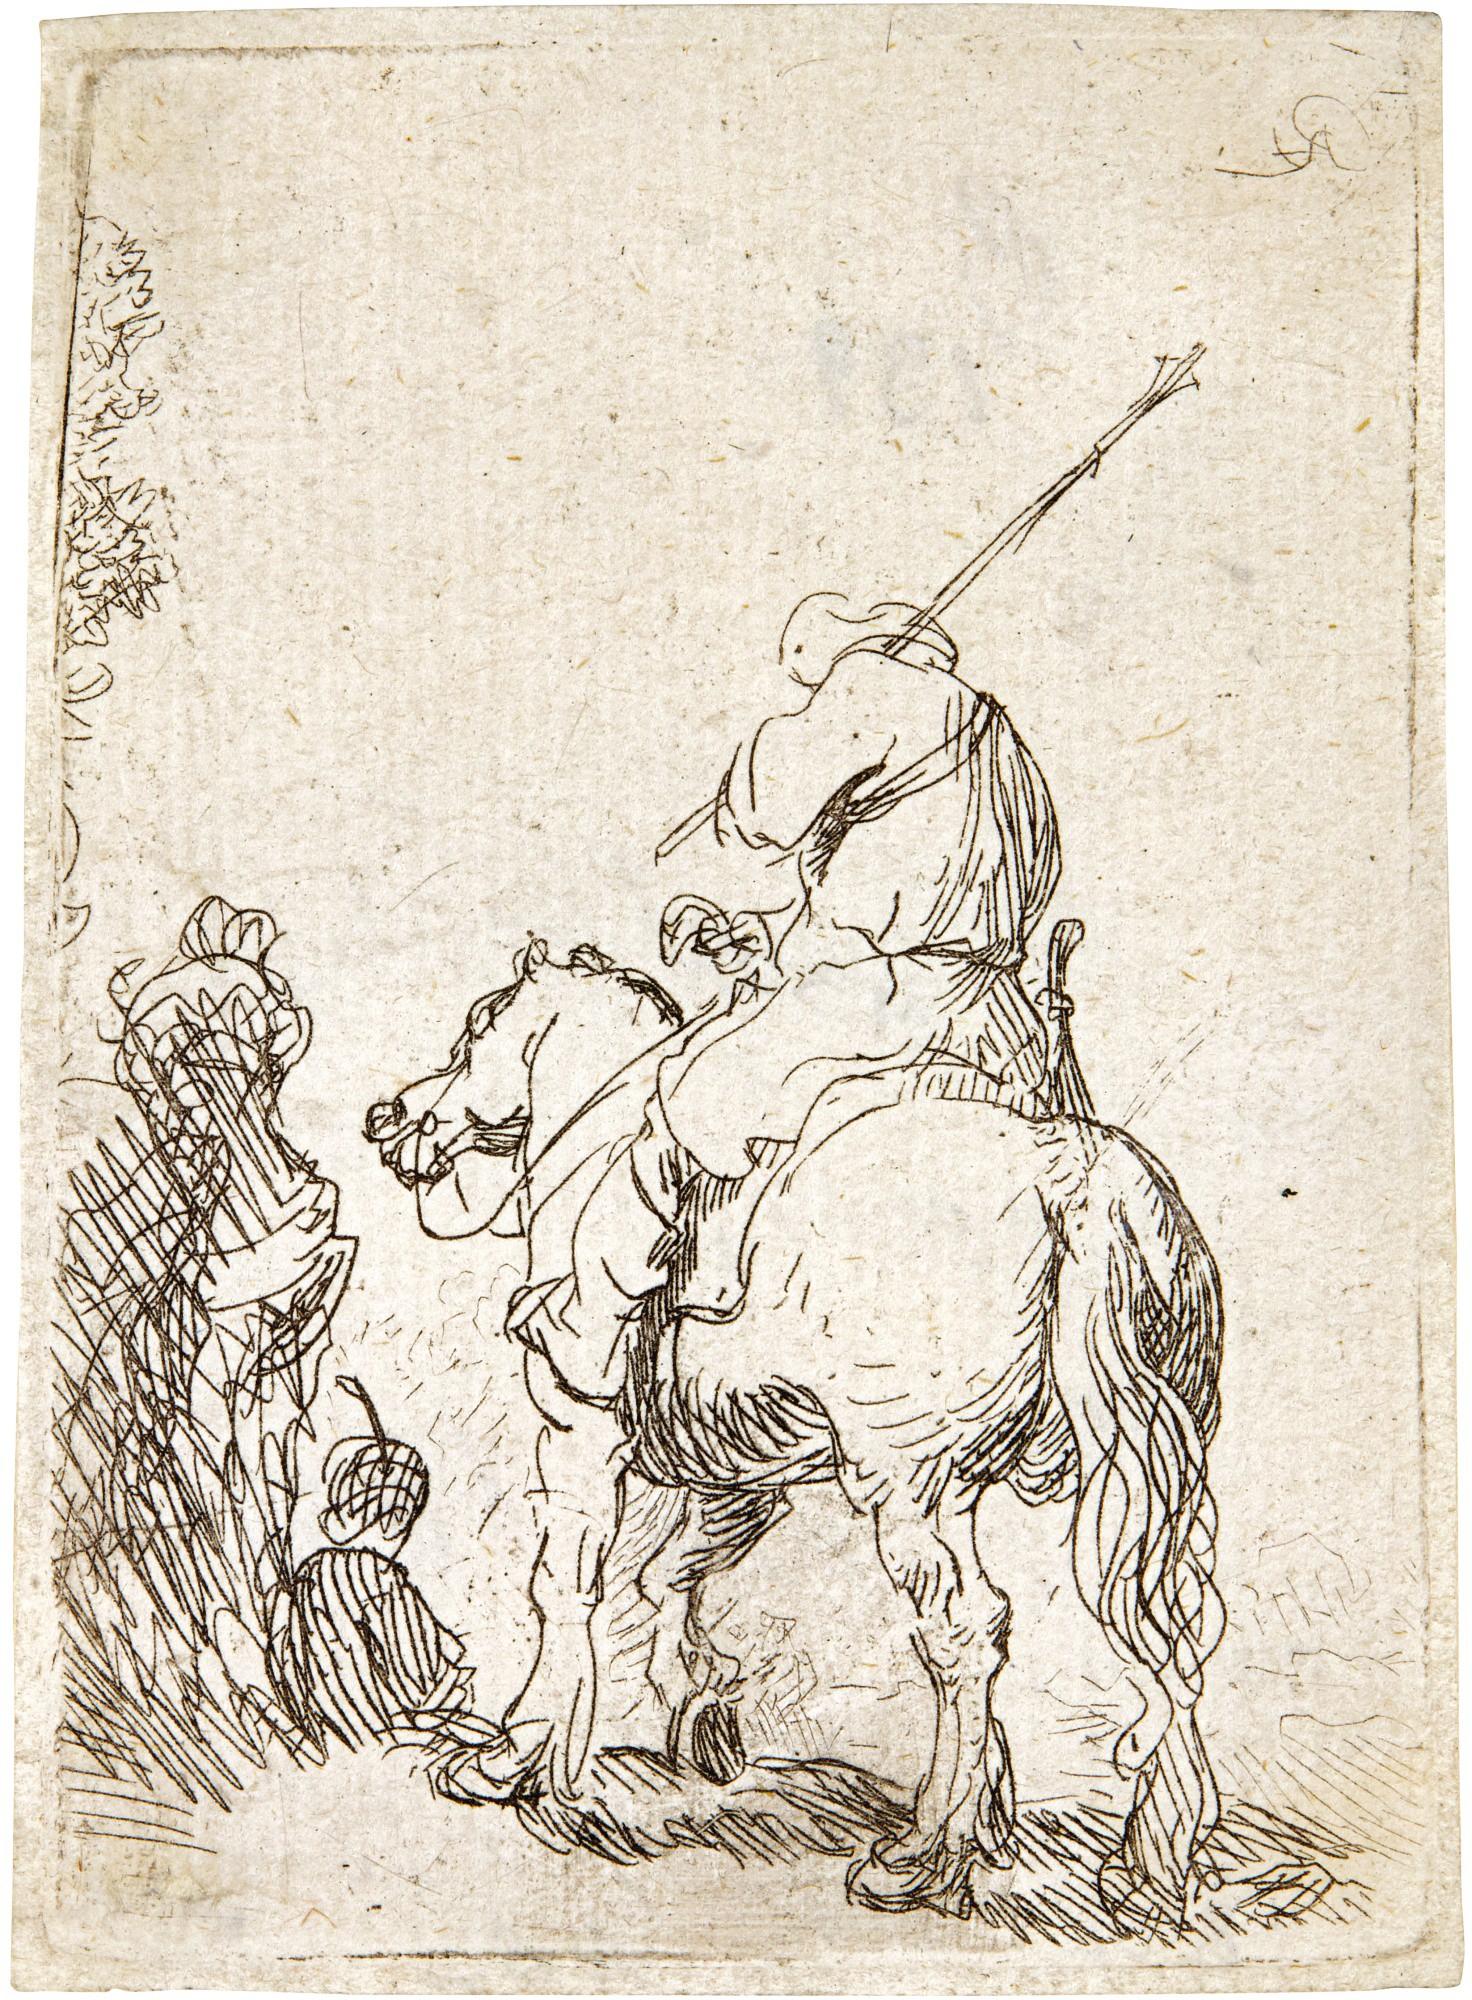 REMBRANDT HARMENSZ. VAN RIJN   TURBANED SOLDIER ON HORSEBACK (B., HOLL. 139; NEW HOLL. 43; H. 99)